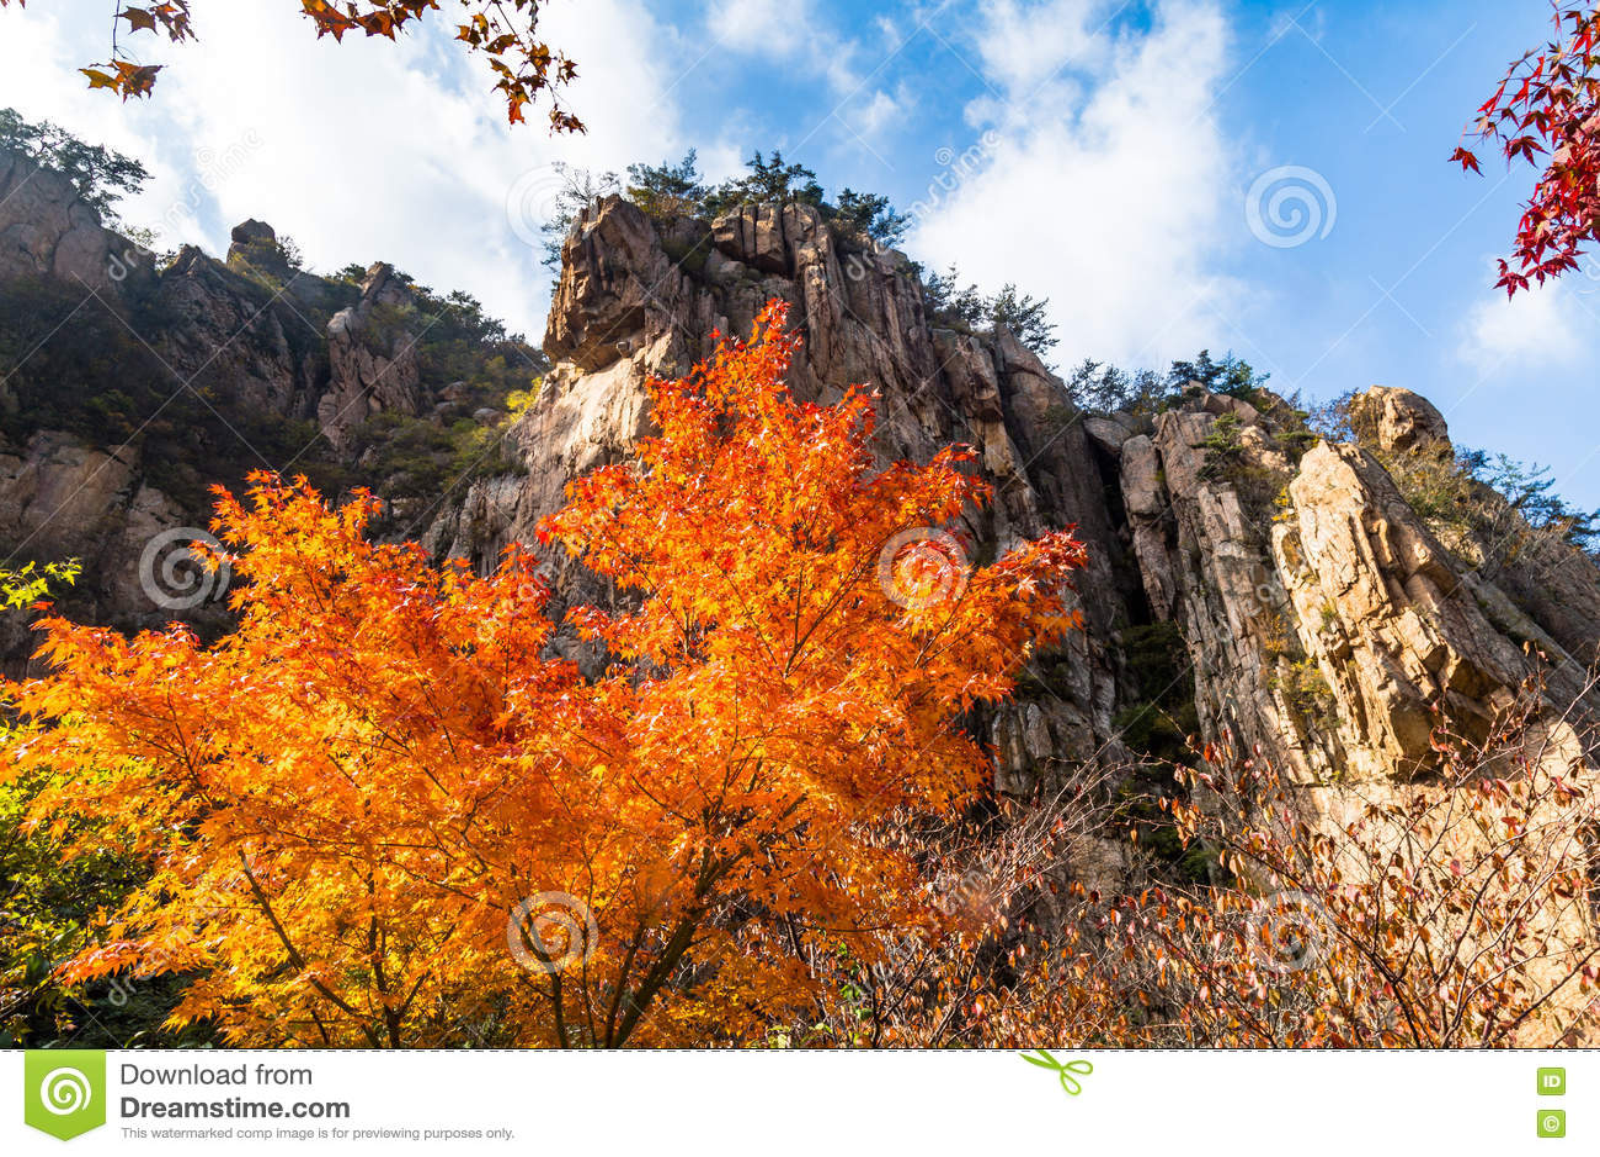 Листья осени в Bei Jiu Shui отстают, гора Laoshan, Qingdao, Китай